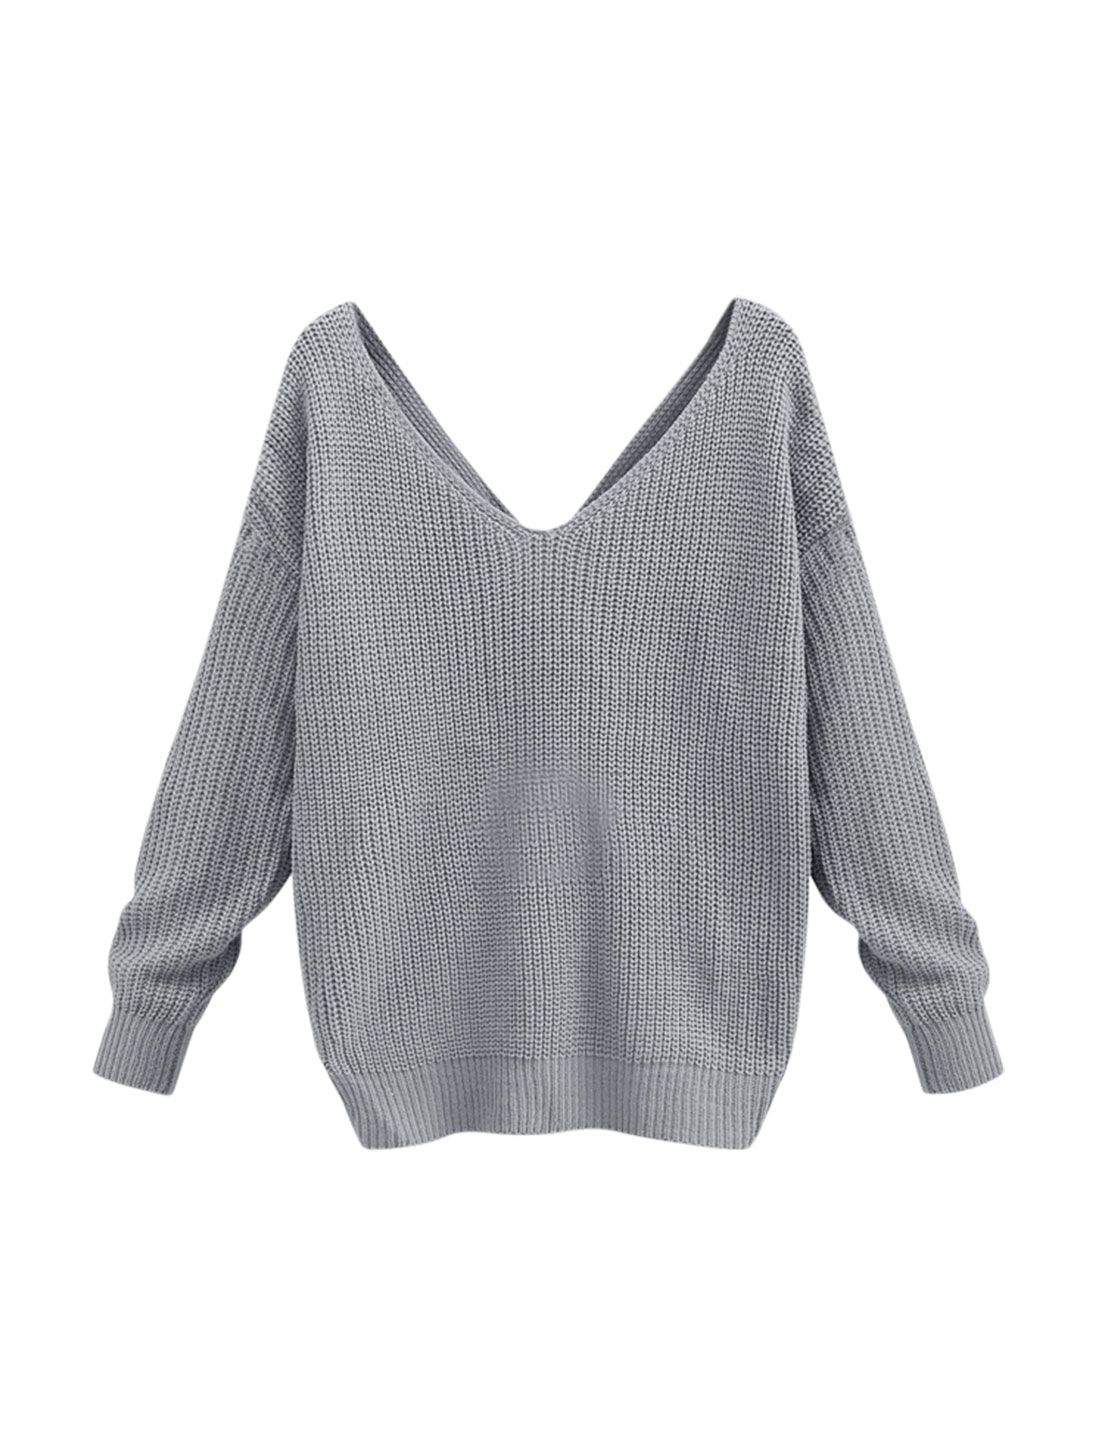 Women V Neck Long Batwing Sleeves Twist Back Sweater Gray XS